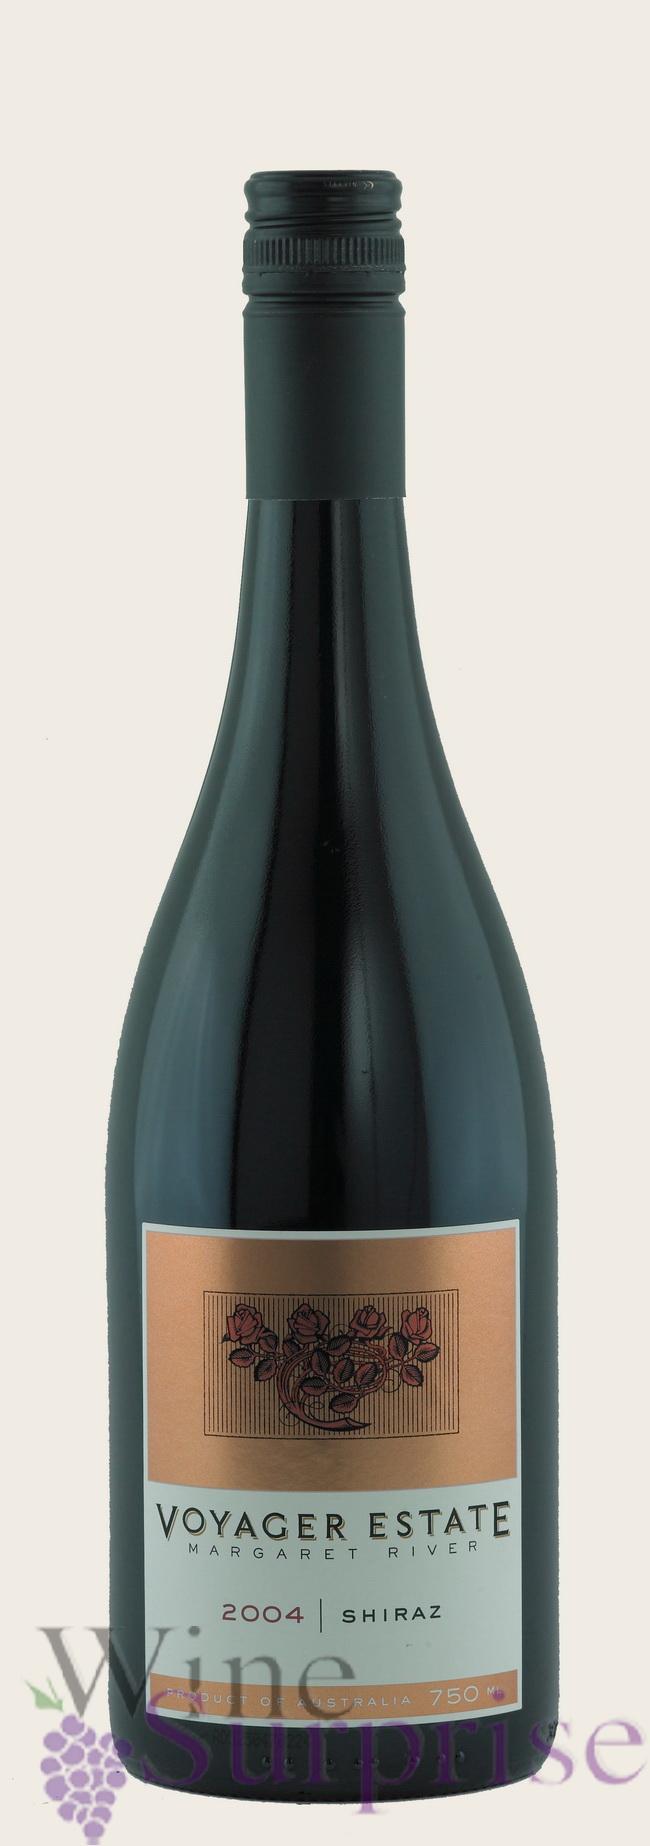 Australian Shiraz Wine 10 Best Red Wine Brands